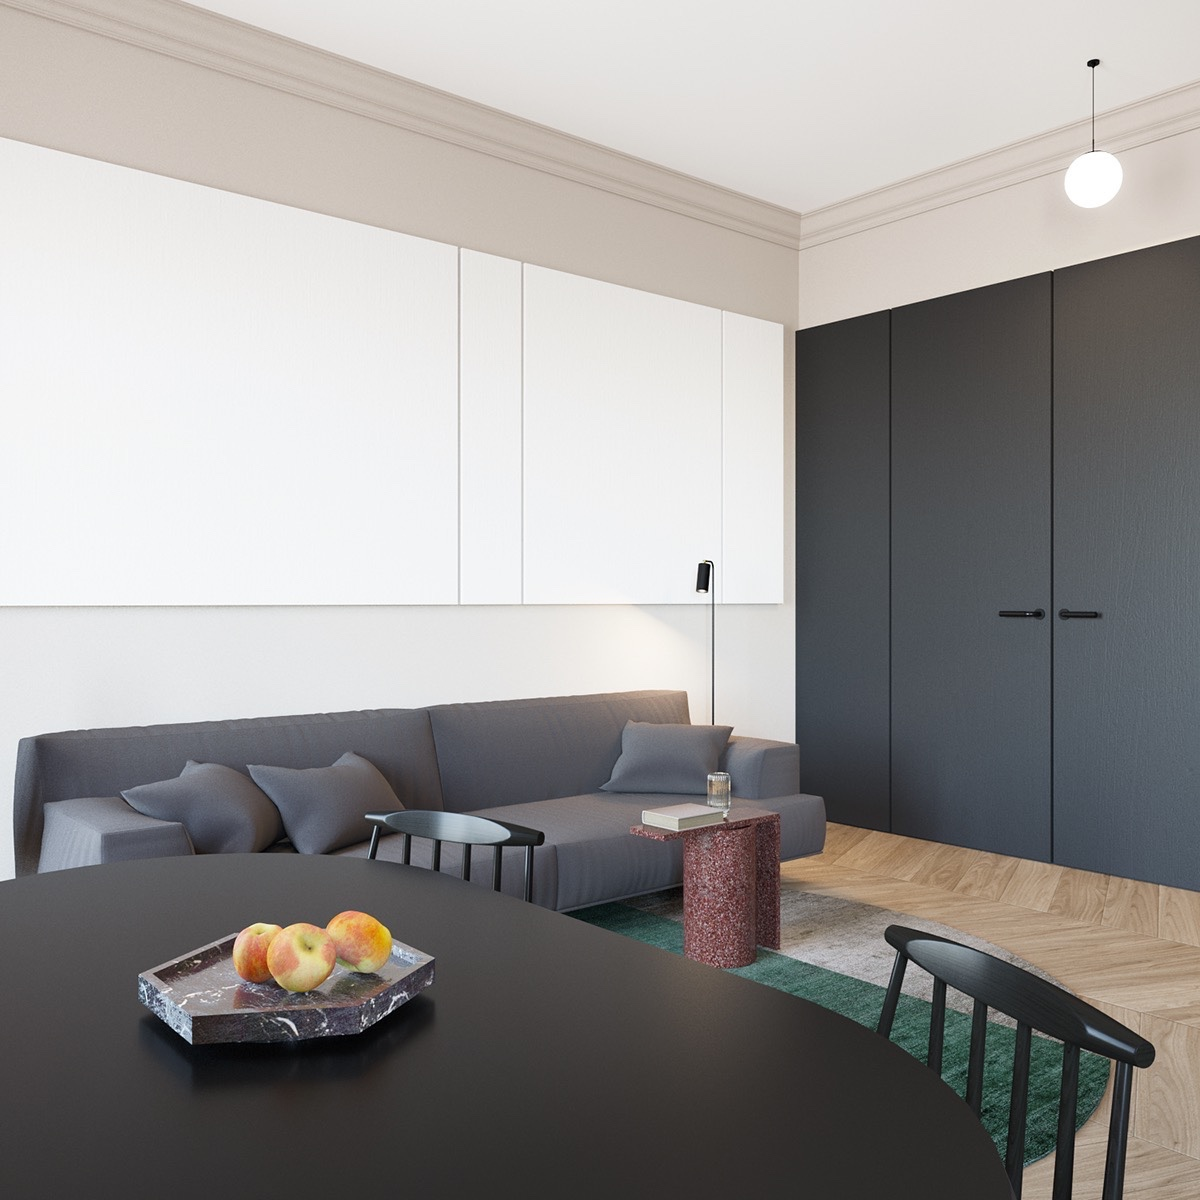 Small apartment kitchen design minimalist wonderful for Minimalist small apartment